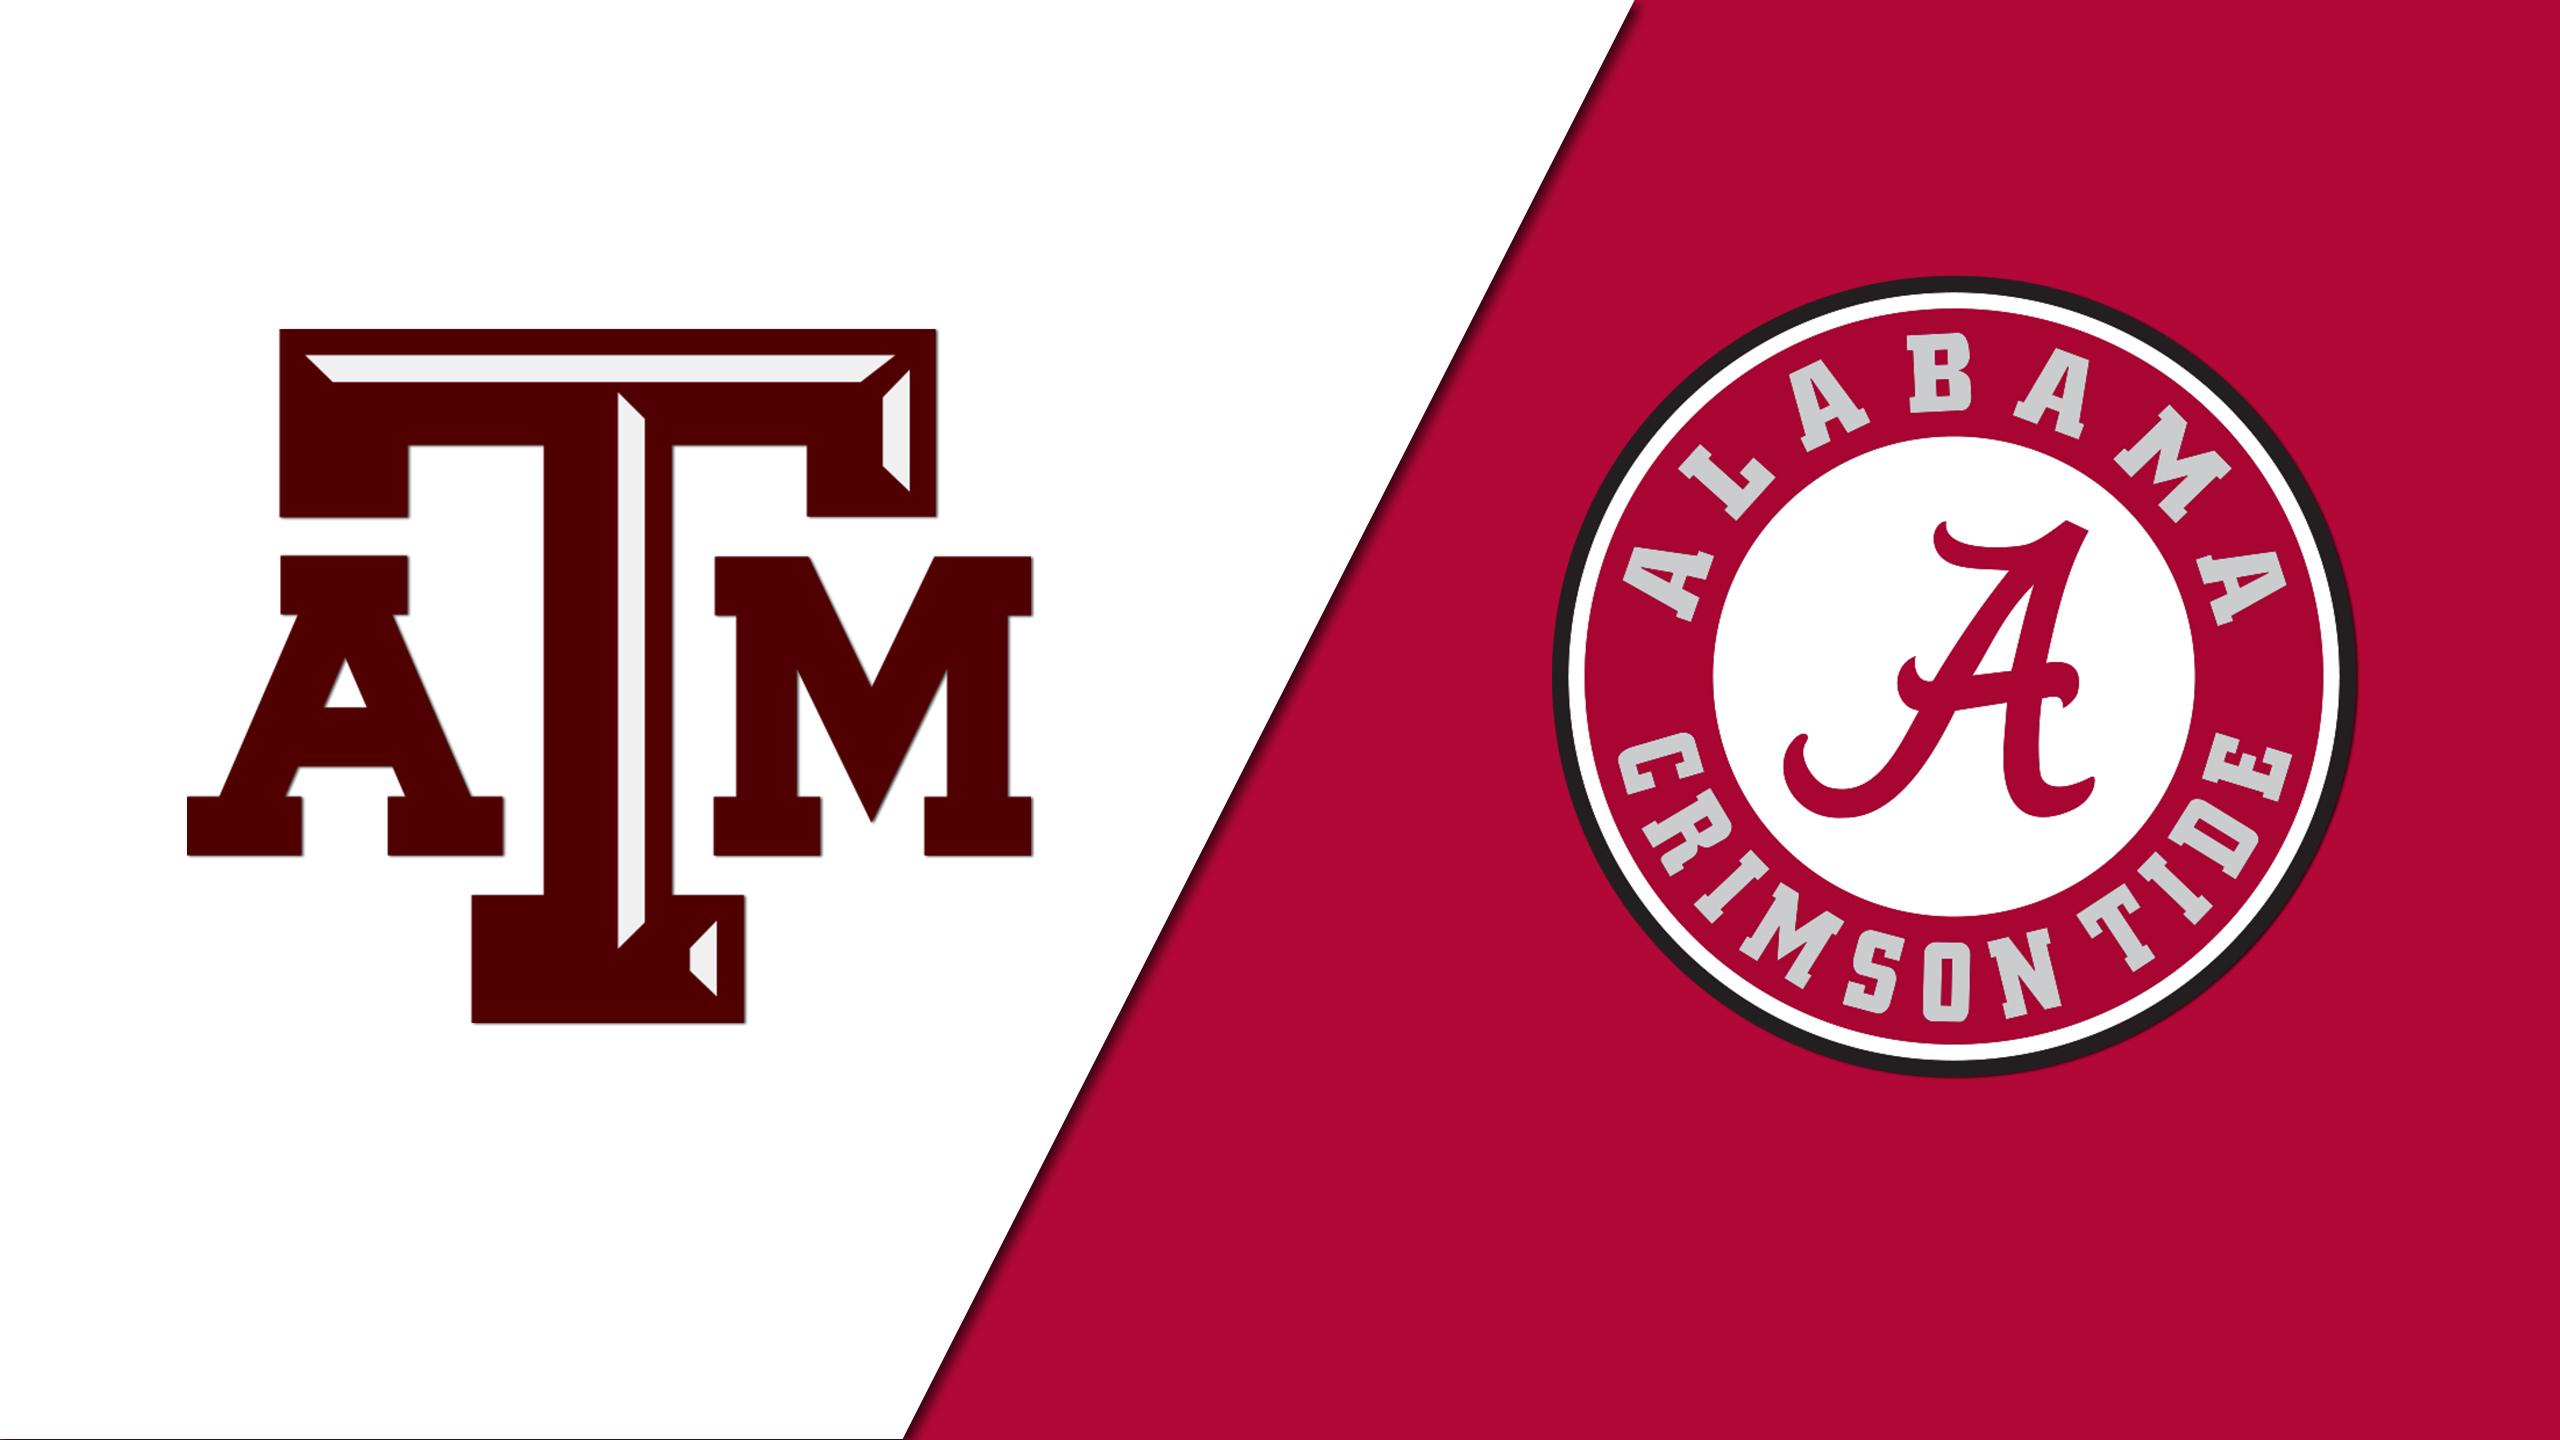 Texas A&M vs. Alabama (Football)